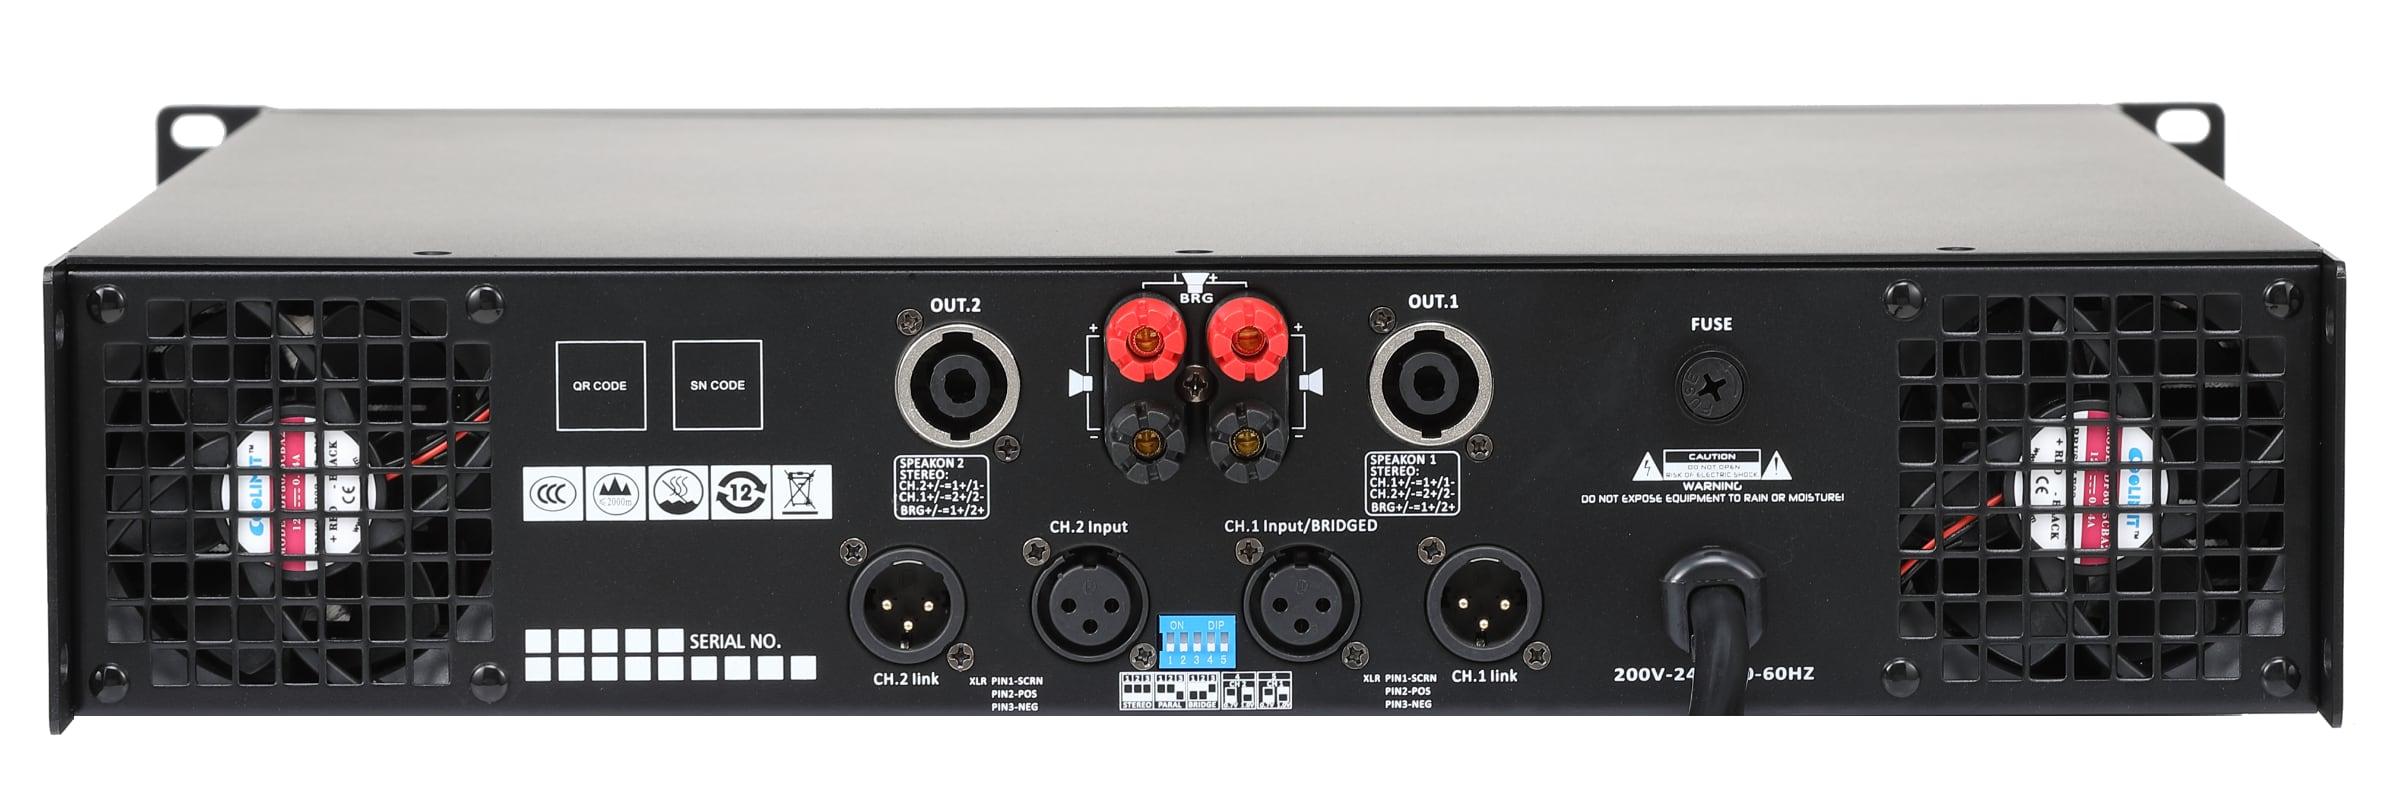 Công suất  AAP TD-6002